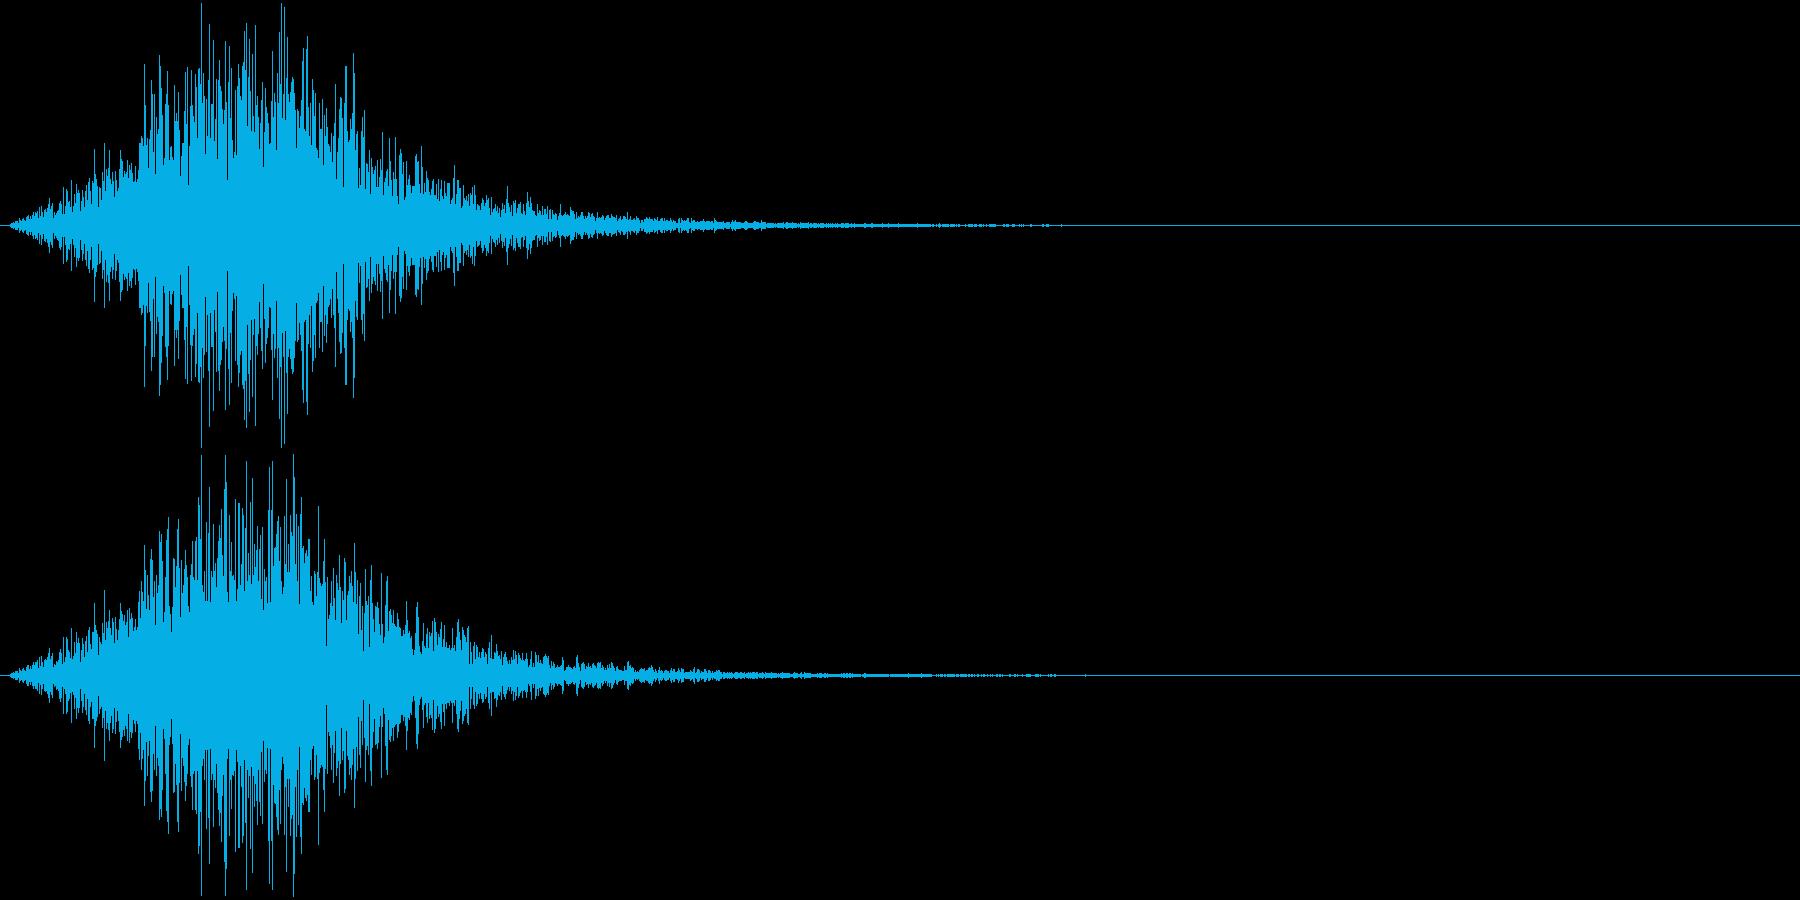 Battle 戦闘エフェクト音 12の再生済みの波形